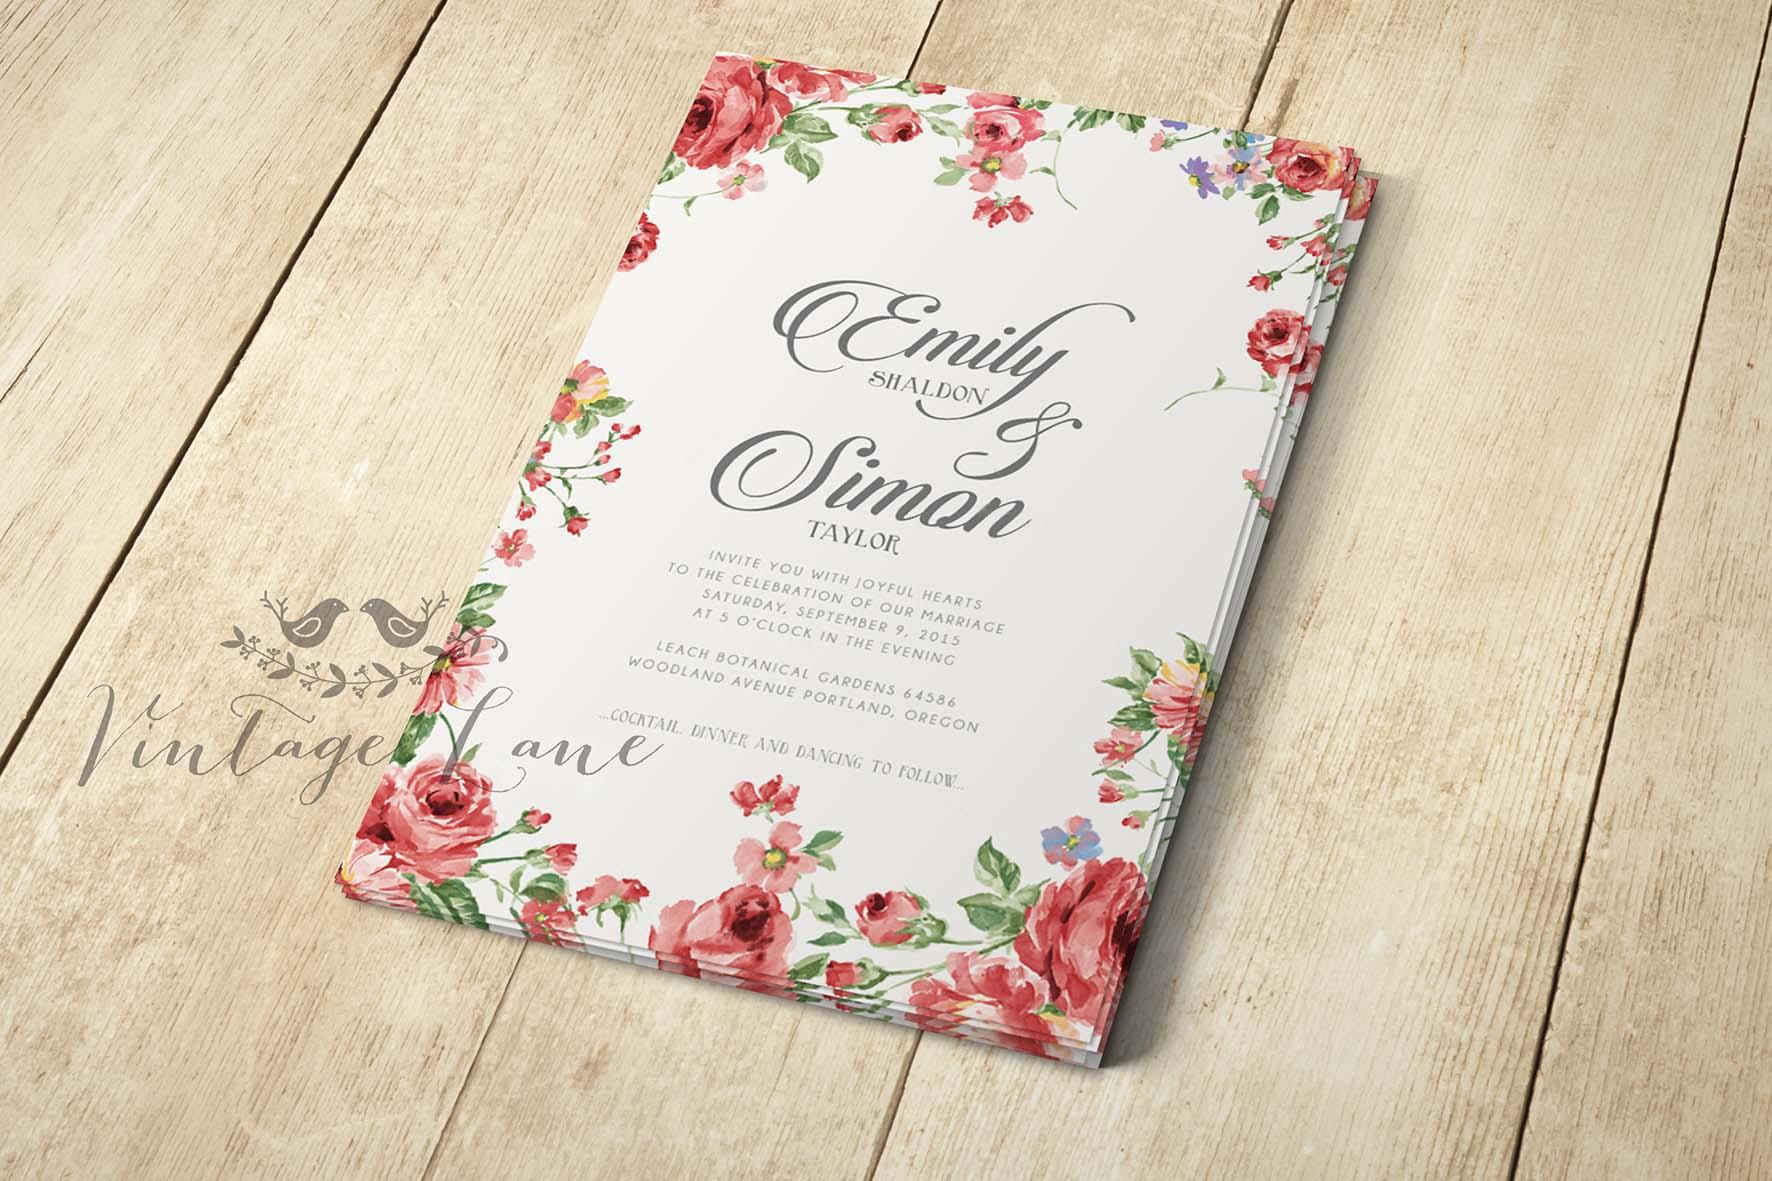 Vintage Wedding Invitations Ireland | Wedding